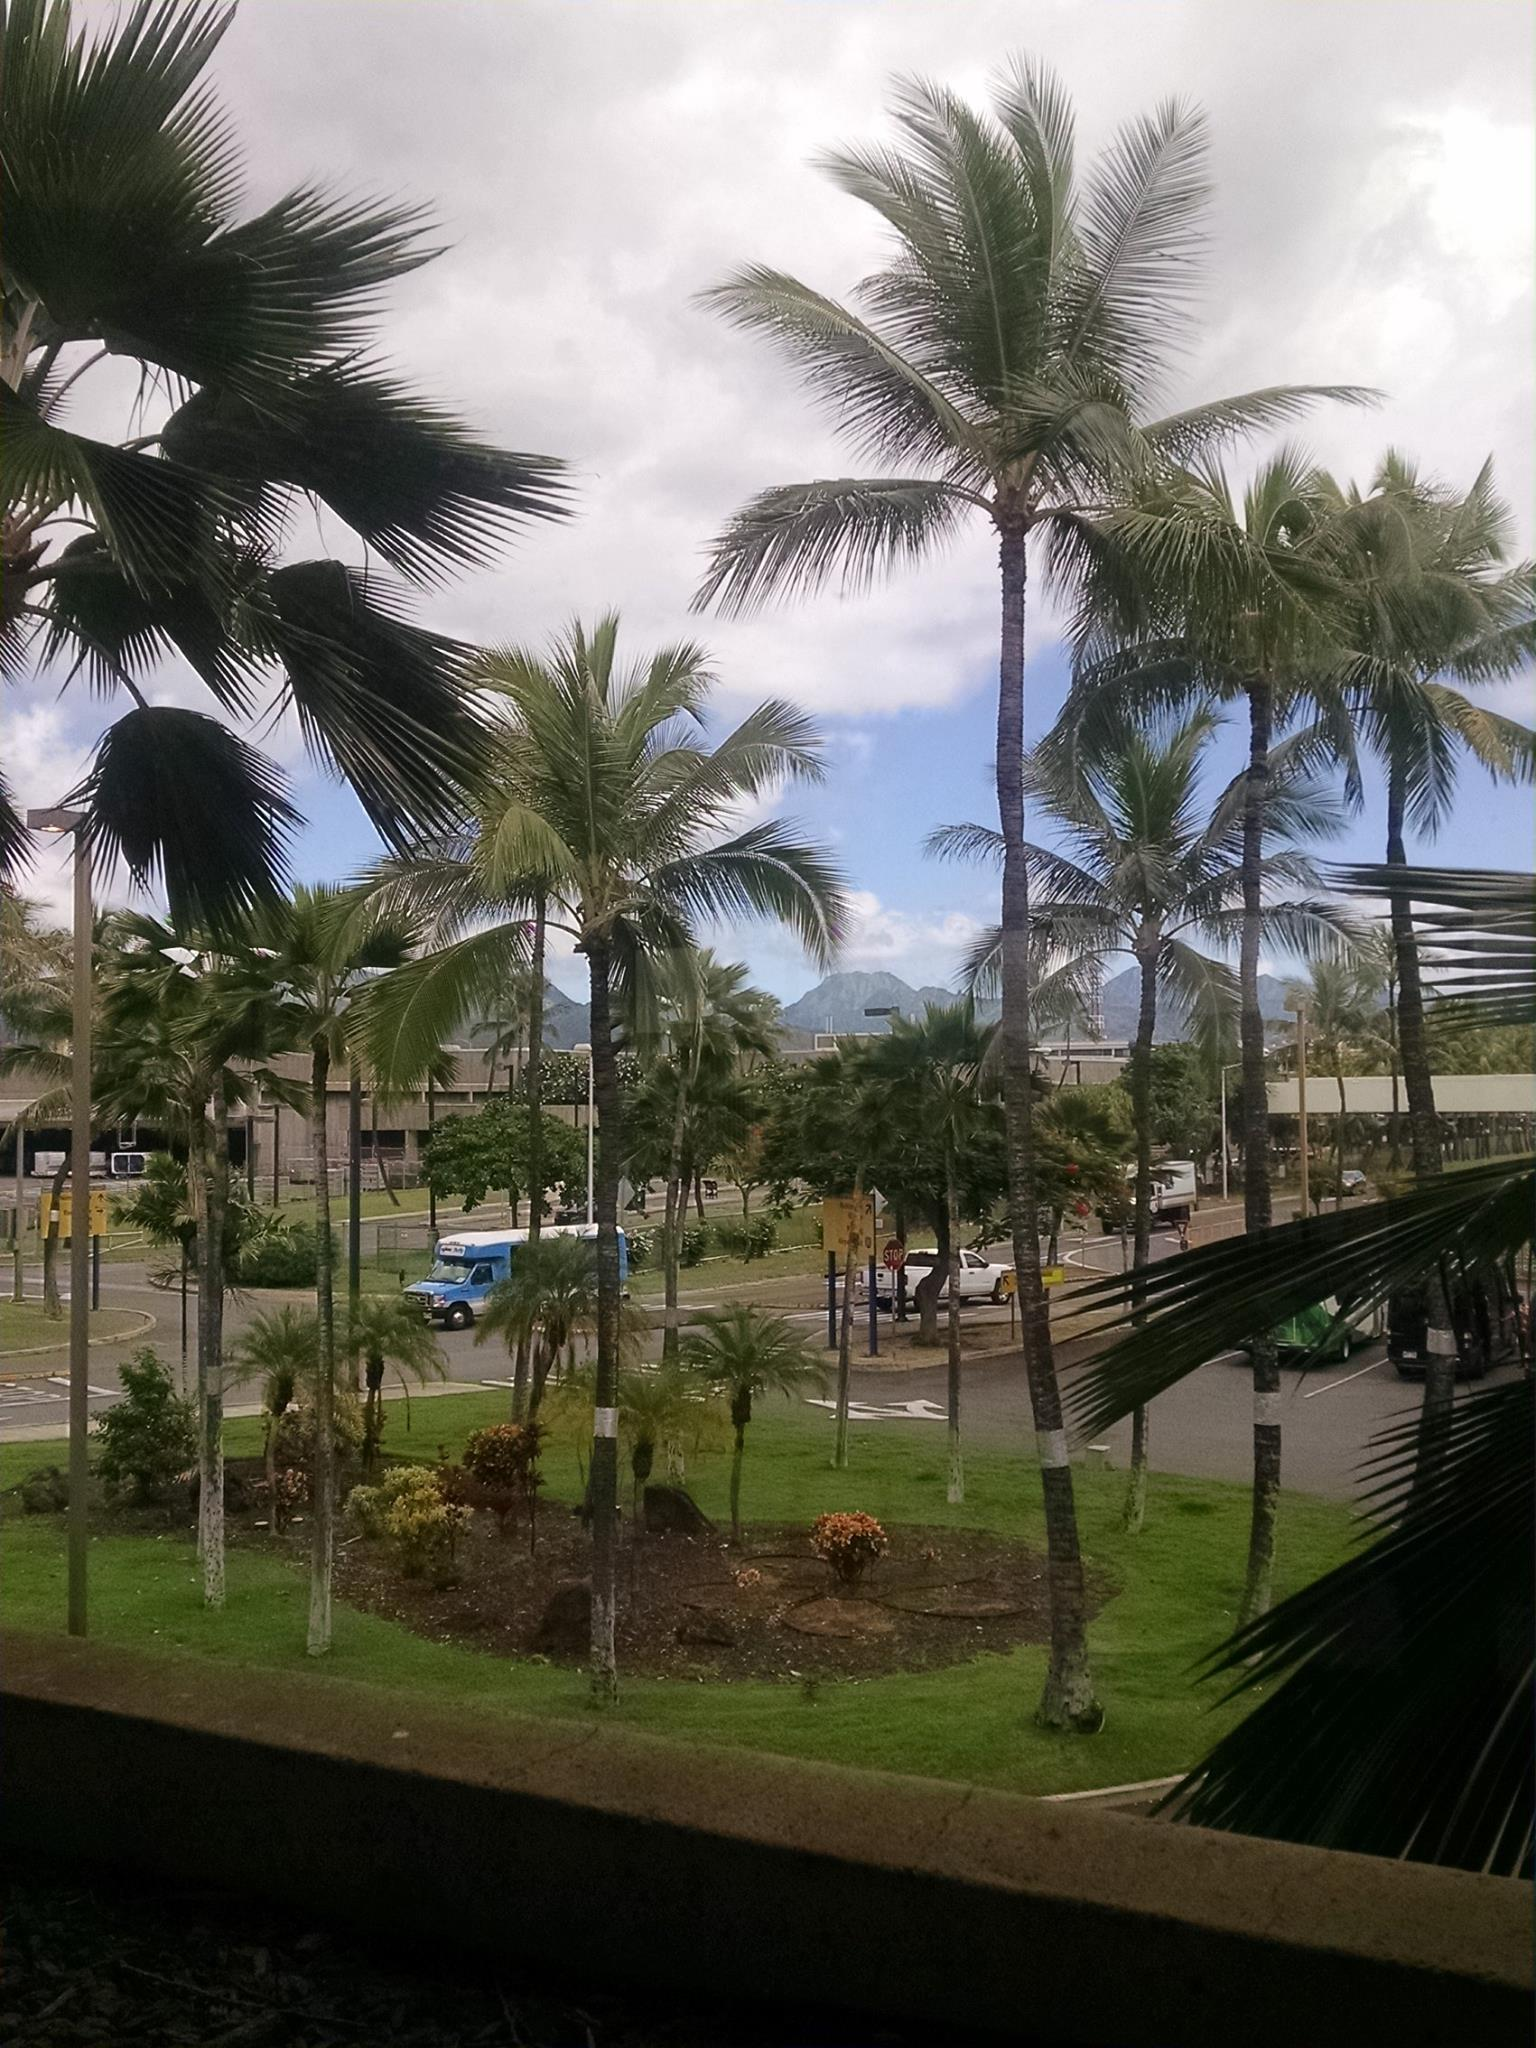 Honolulu...almost home